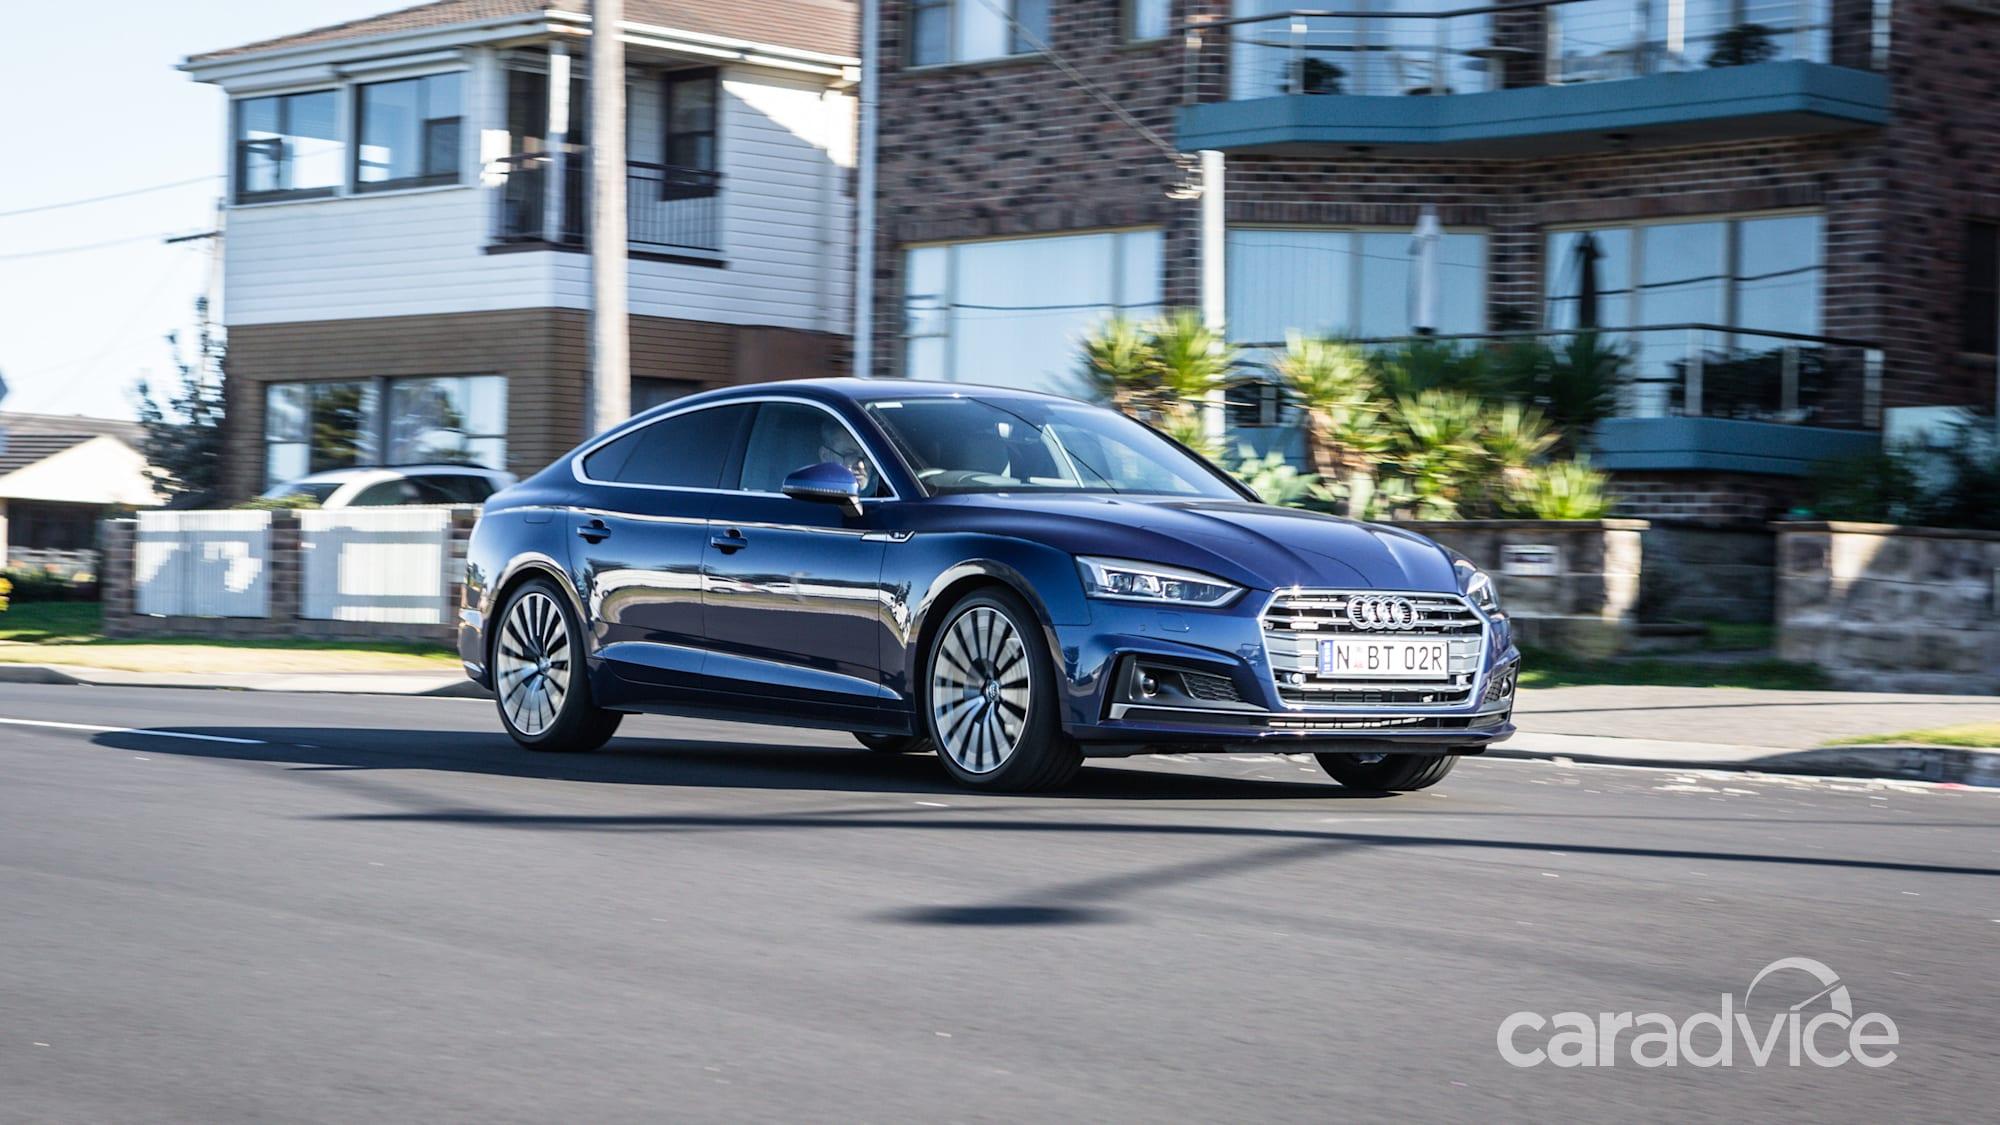 2017 Audi A5 Sportback 2.0 TFSI quattro review   CarAdvice